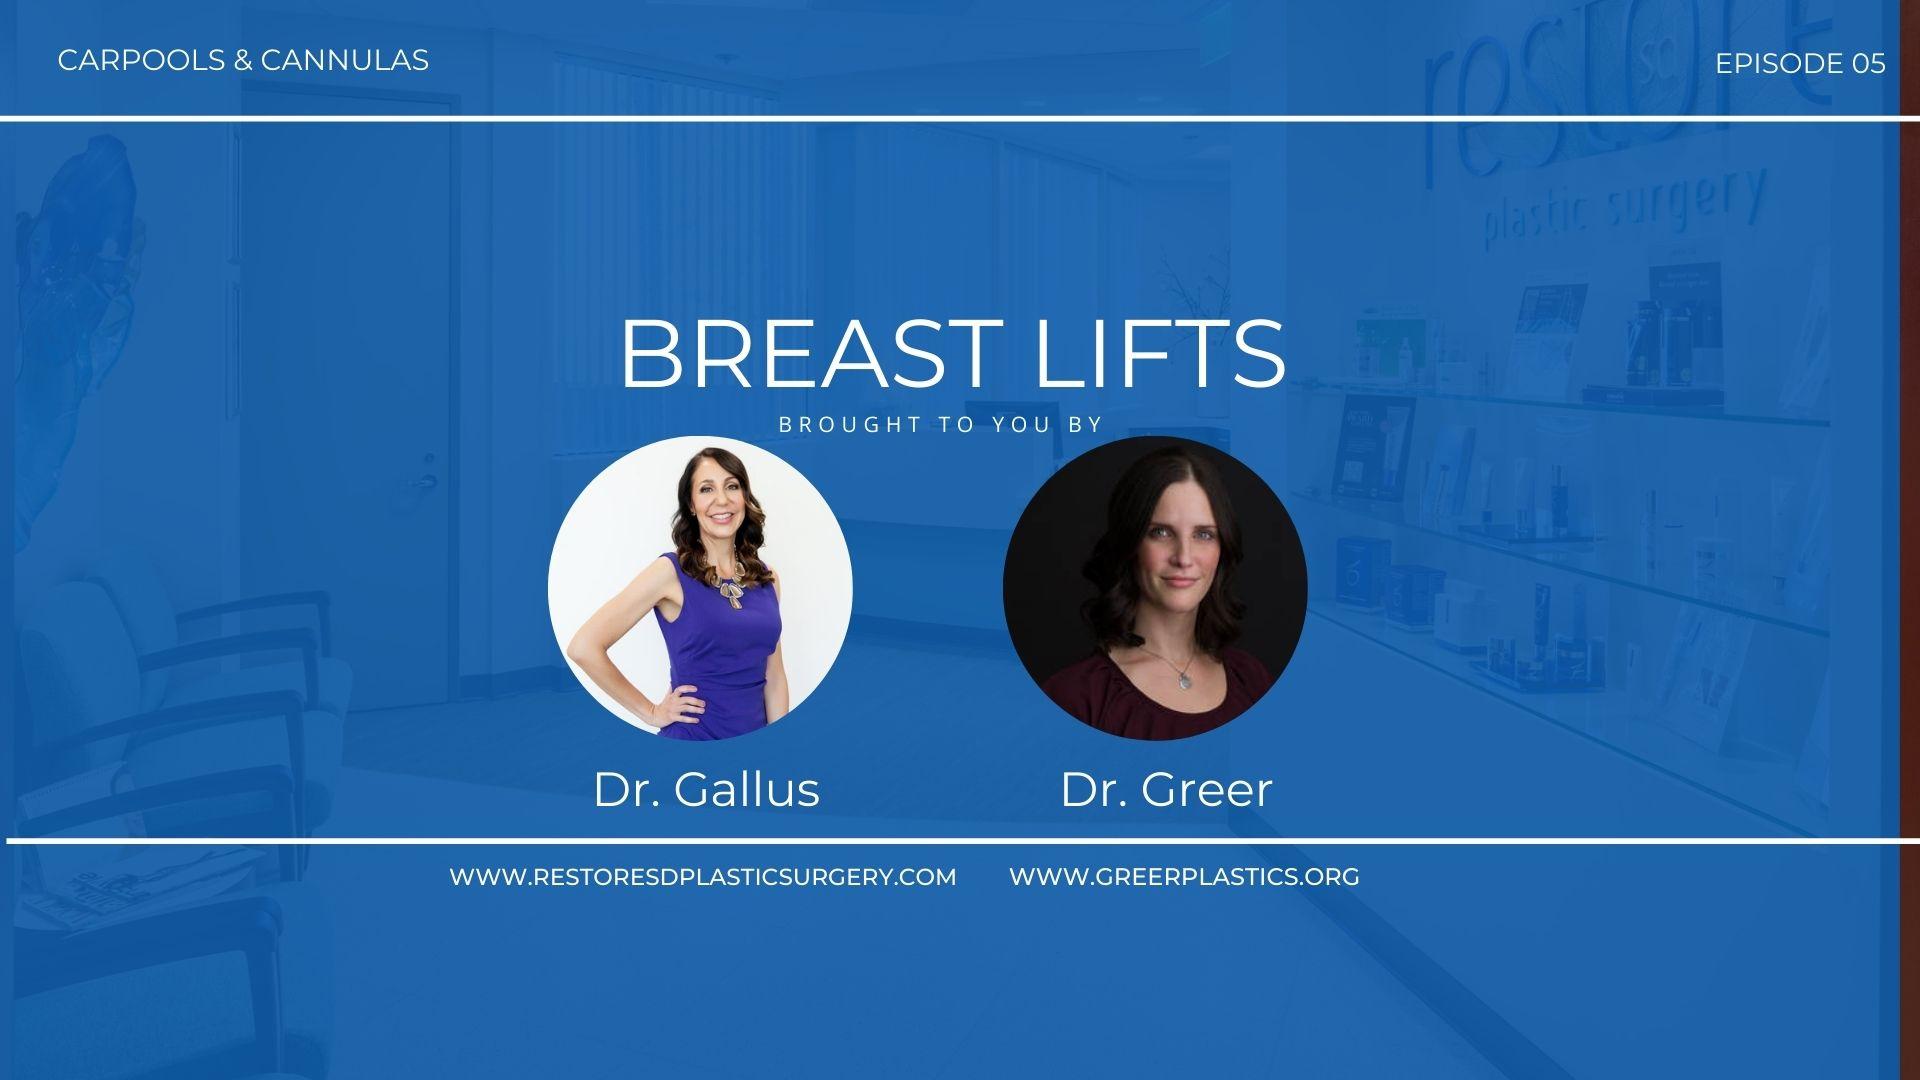 Carpools & Cannulas Episode 5 Breast Lift